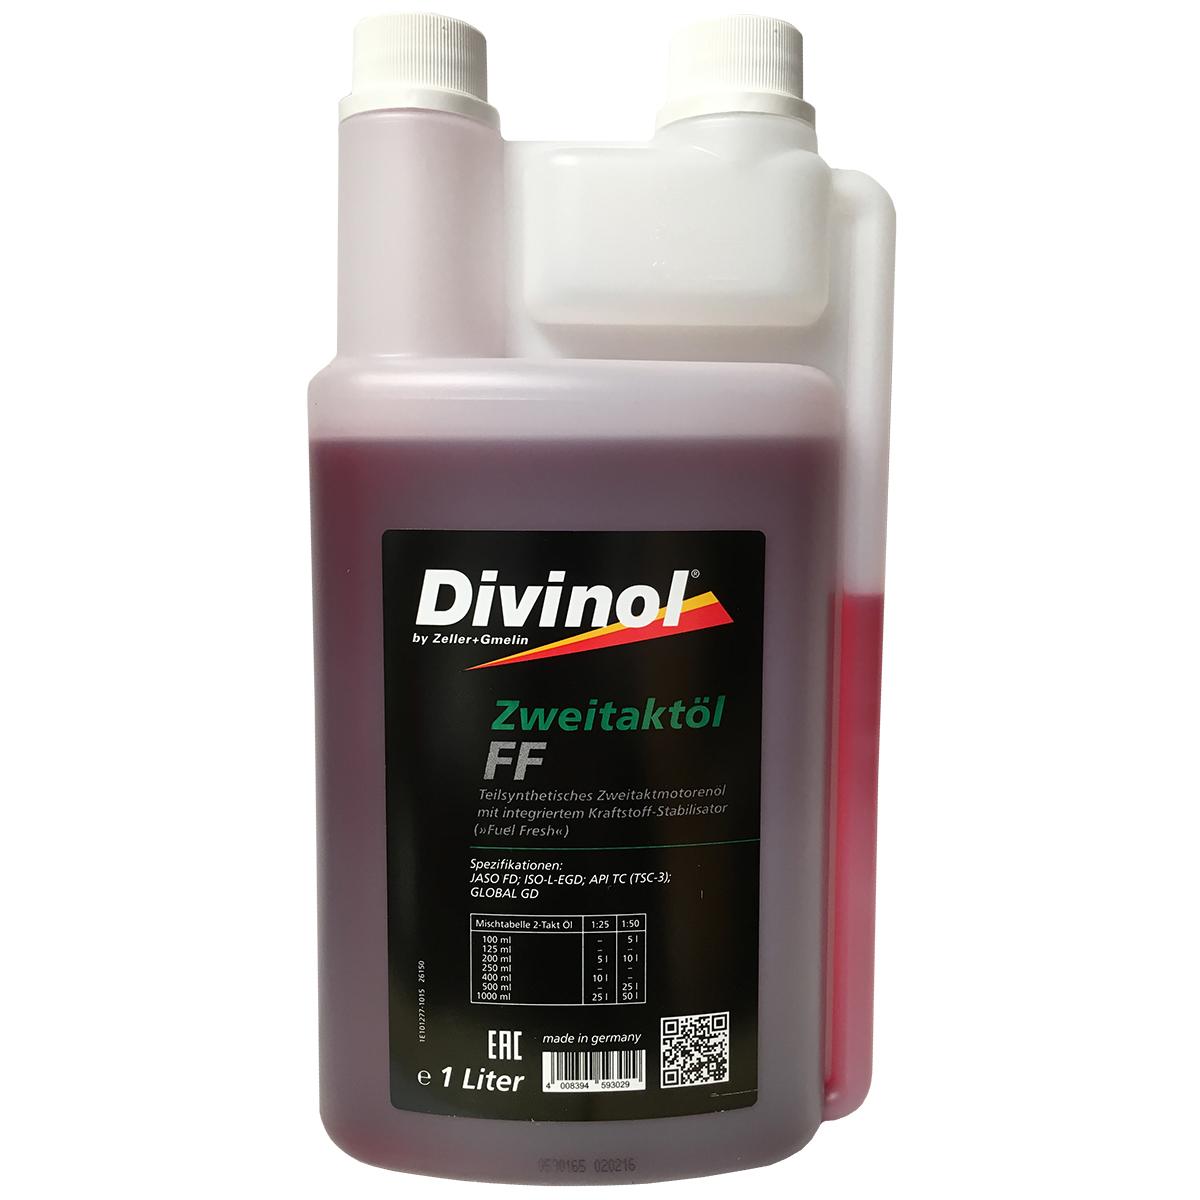 divinol zweitakt l ff 1 l dosierflasche 2 takt l 2t motor l motors ge motorsens ebay. Black Bedroom Furniture Sets. Home Design Ideas